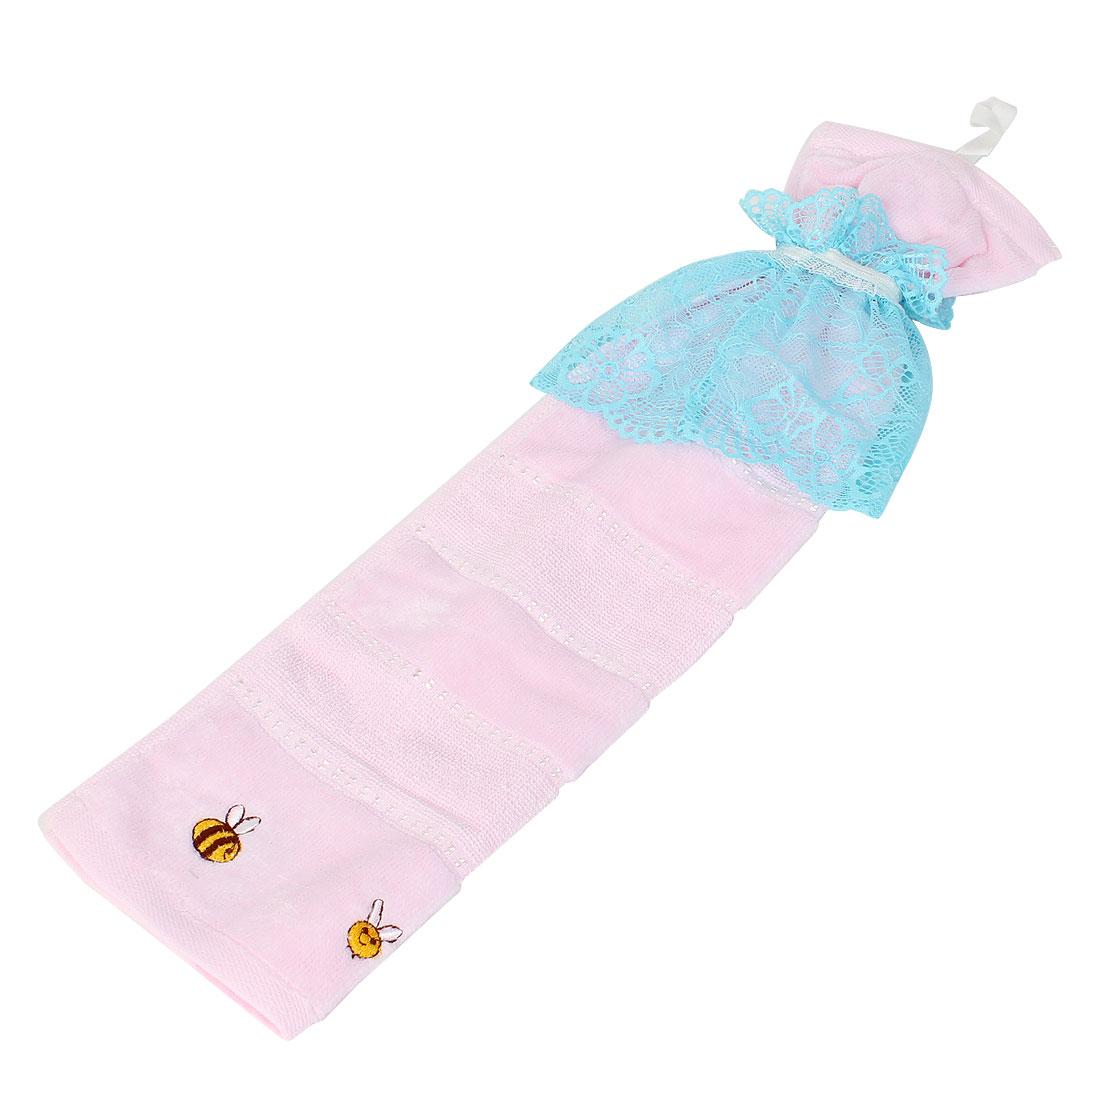 Kitchen Bathroom Cartoon Decor Lace Detail Absorbent Hand Towel Pink Blue